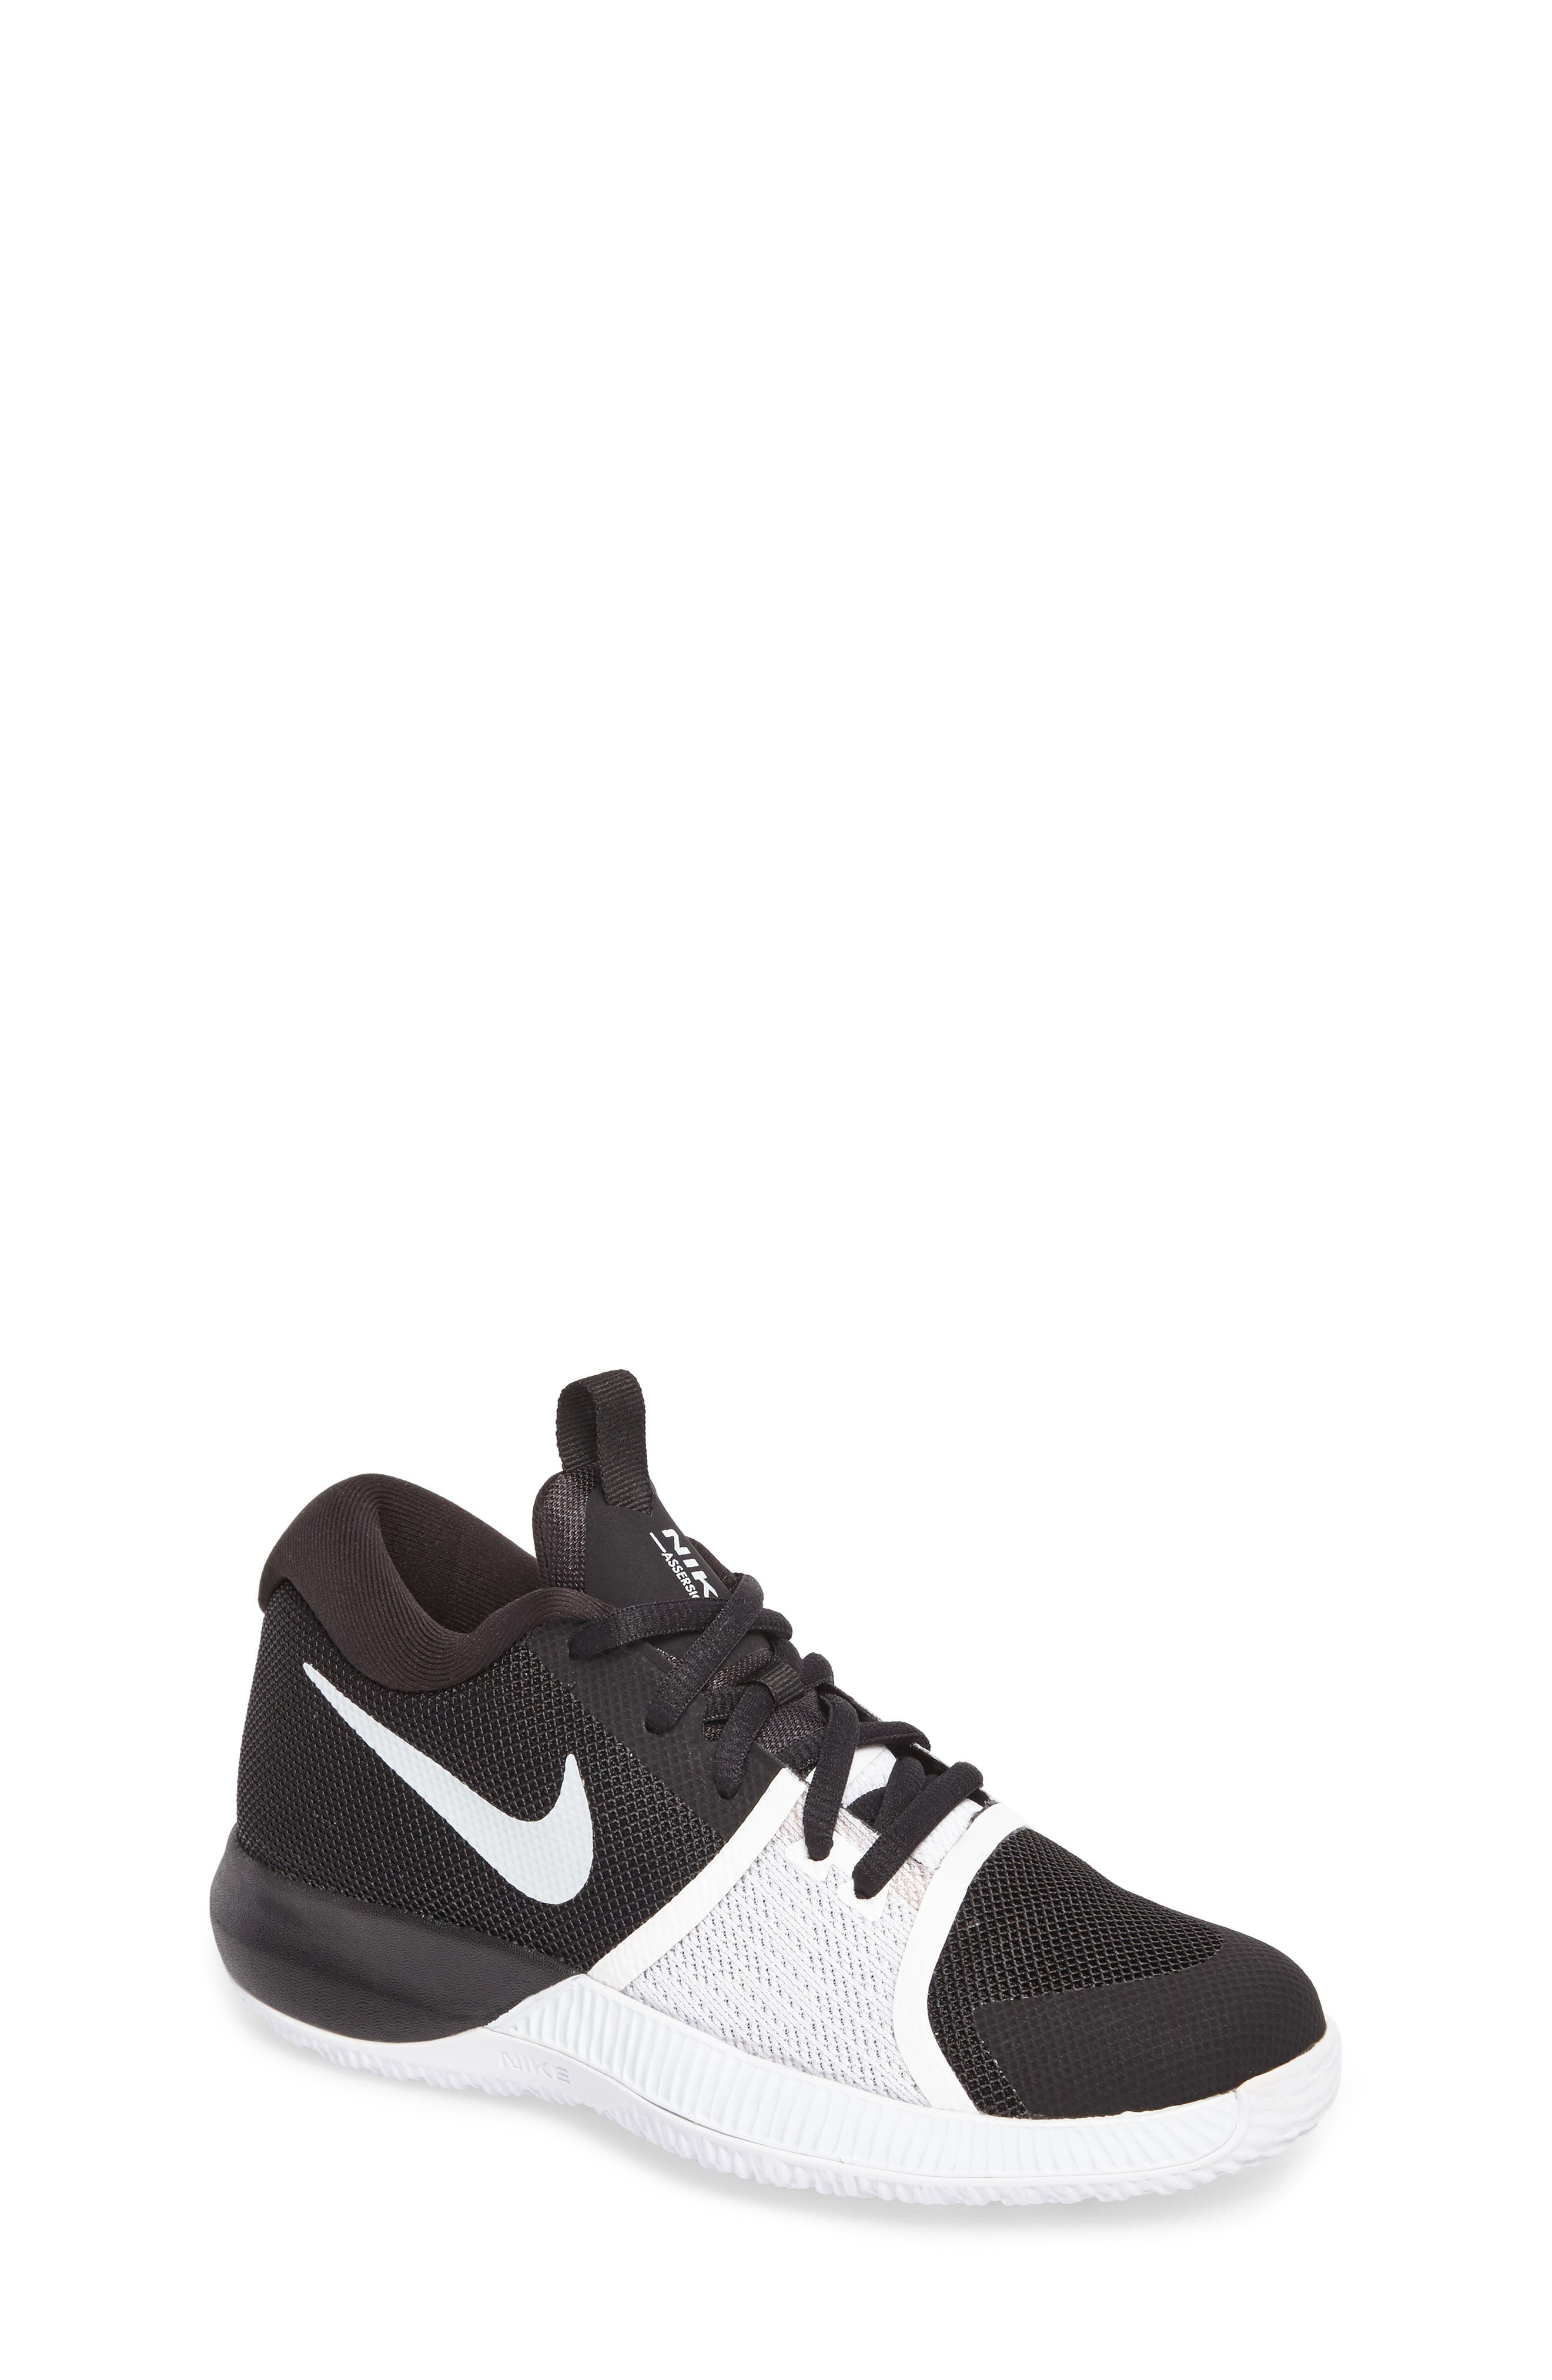 Assersion Sneaker,                             Main thumbnail 1, color,                             Black/ White